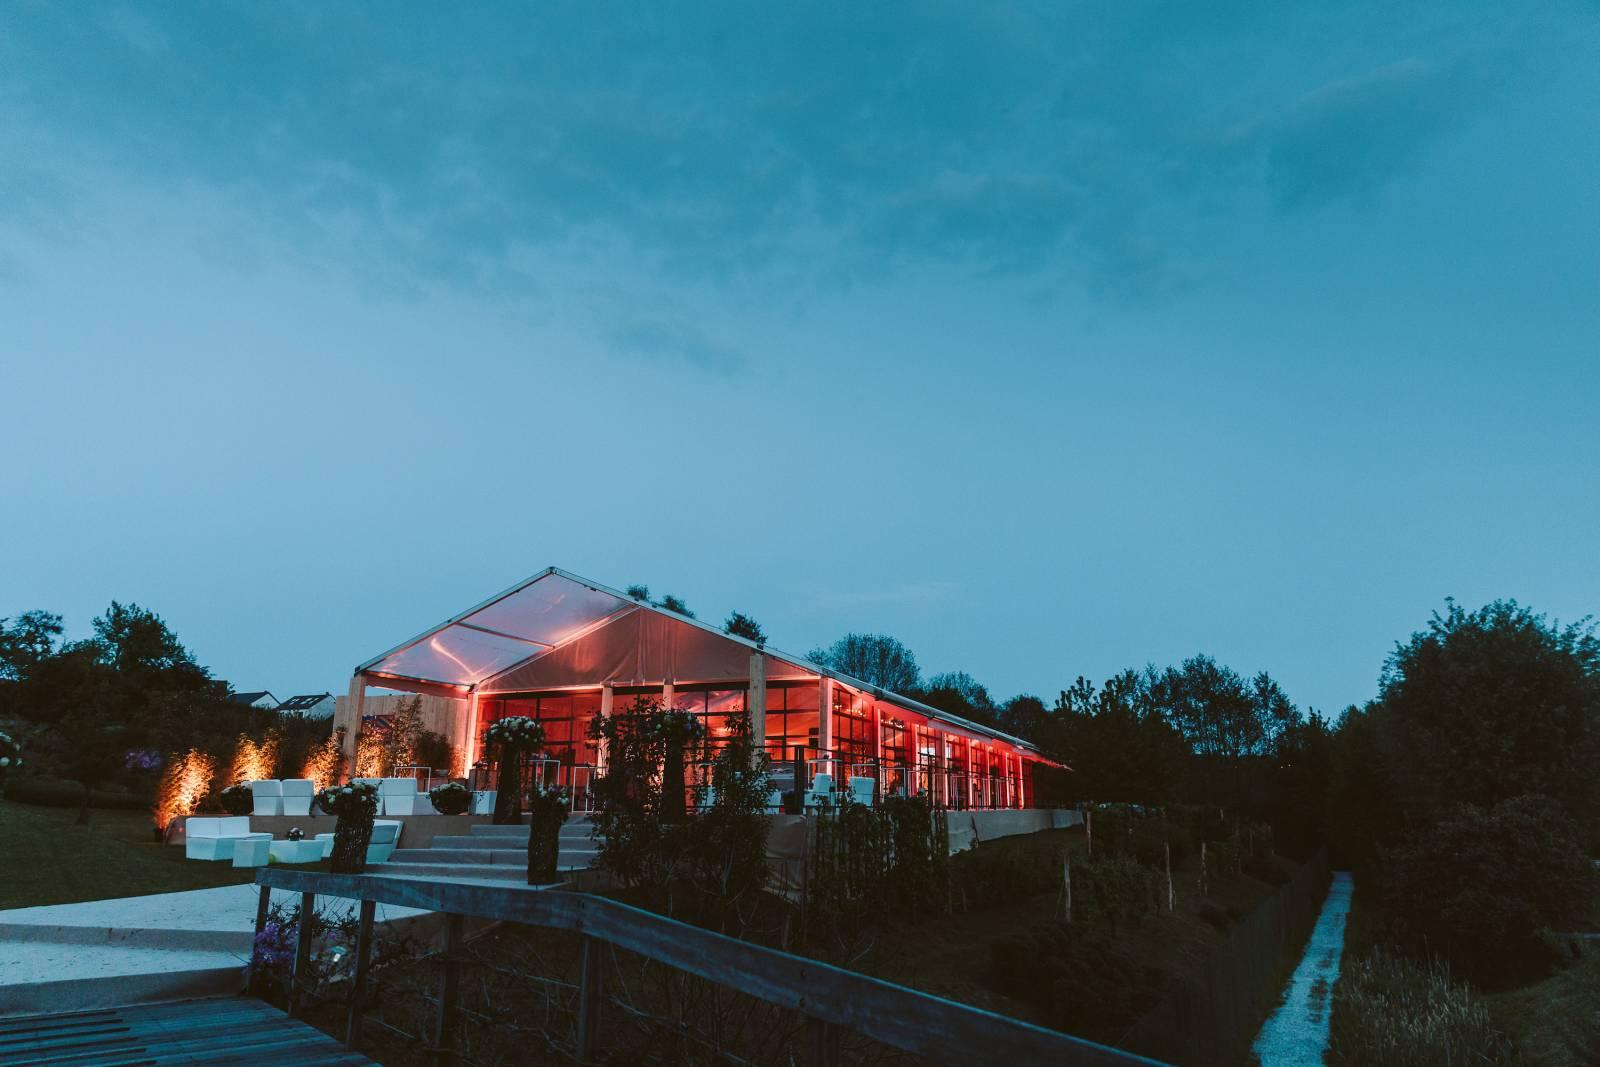 Be Your Guest - Wedding Planner - House of Weddings12-TENTE-2017-Antoine Melis